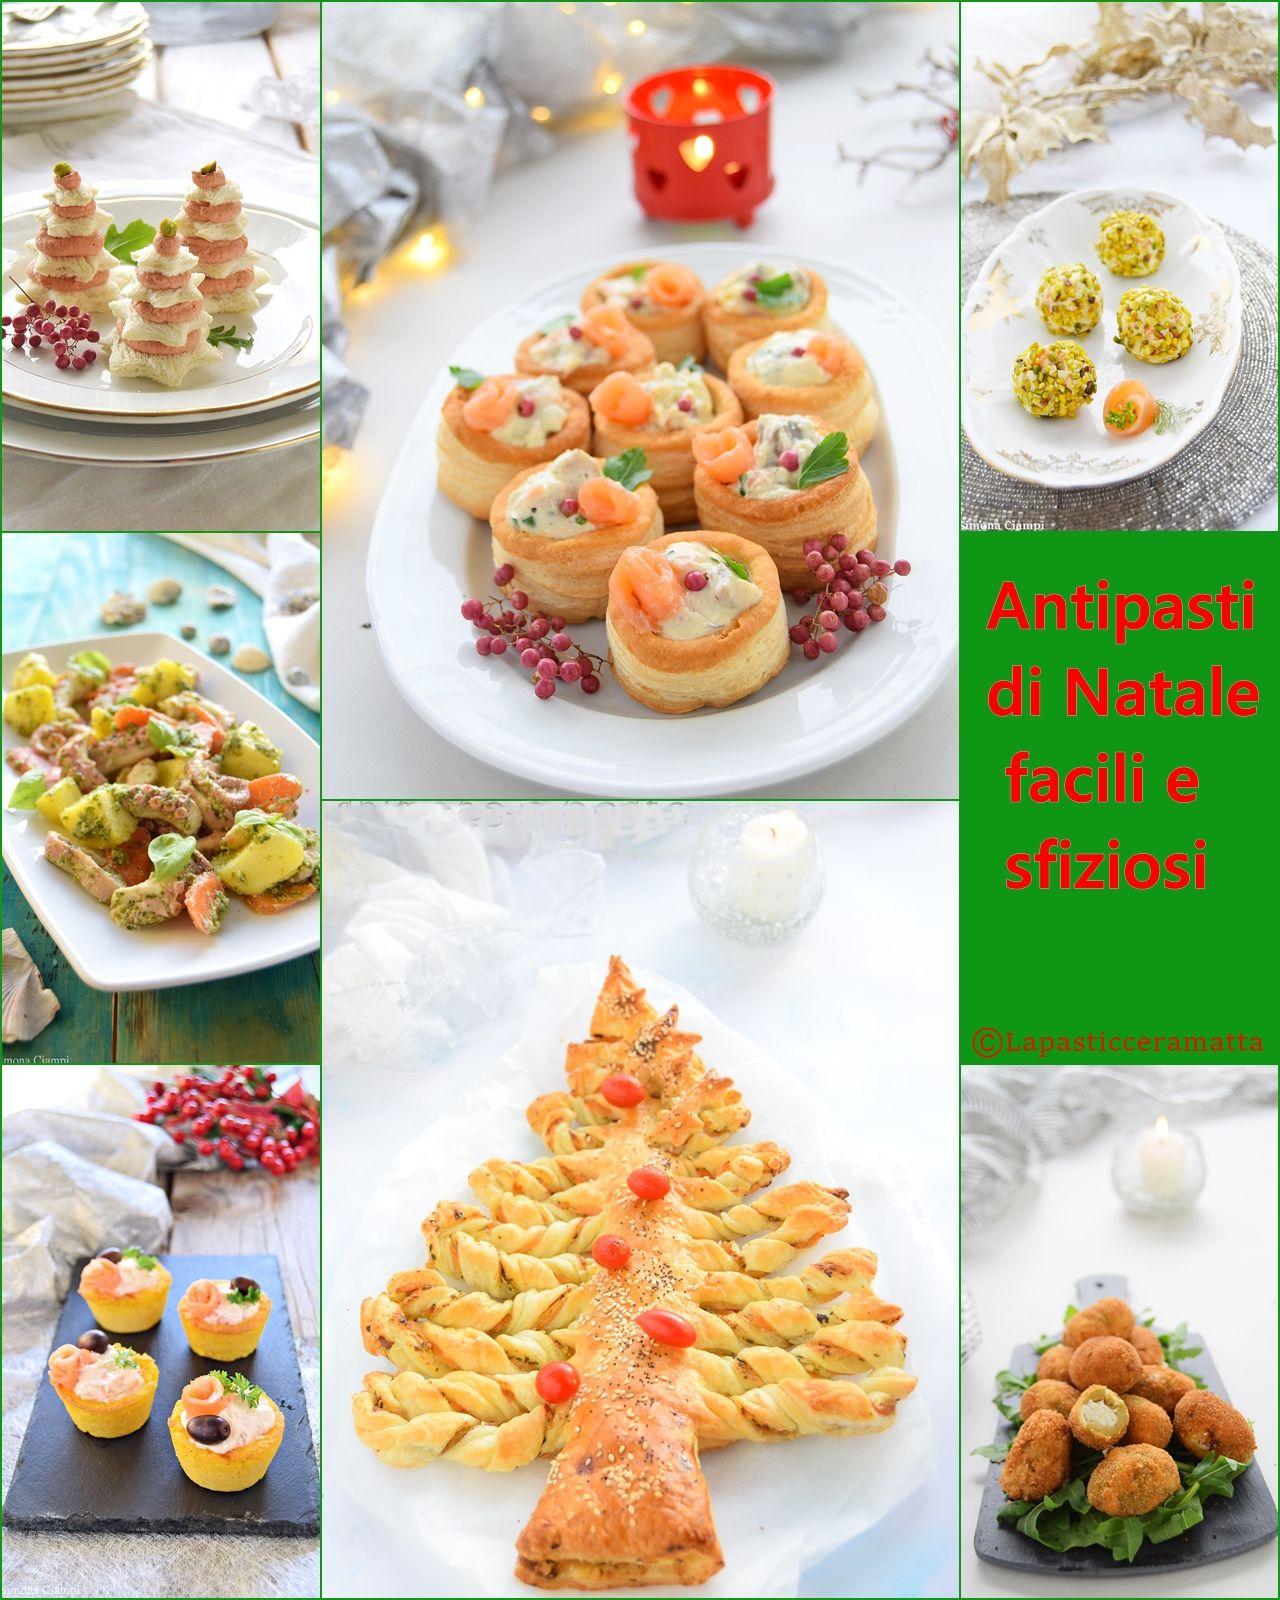 Antipasti natalizi sfiziosi, le ricette. هيكل عظمي اللينينية ذكرى سنوية Ricette Antipasti X Natale Amazon Electricite Generale Haute Savoie Com